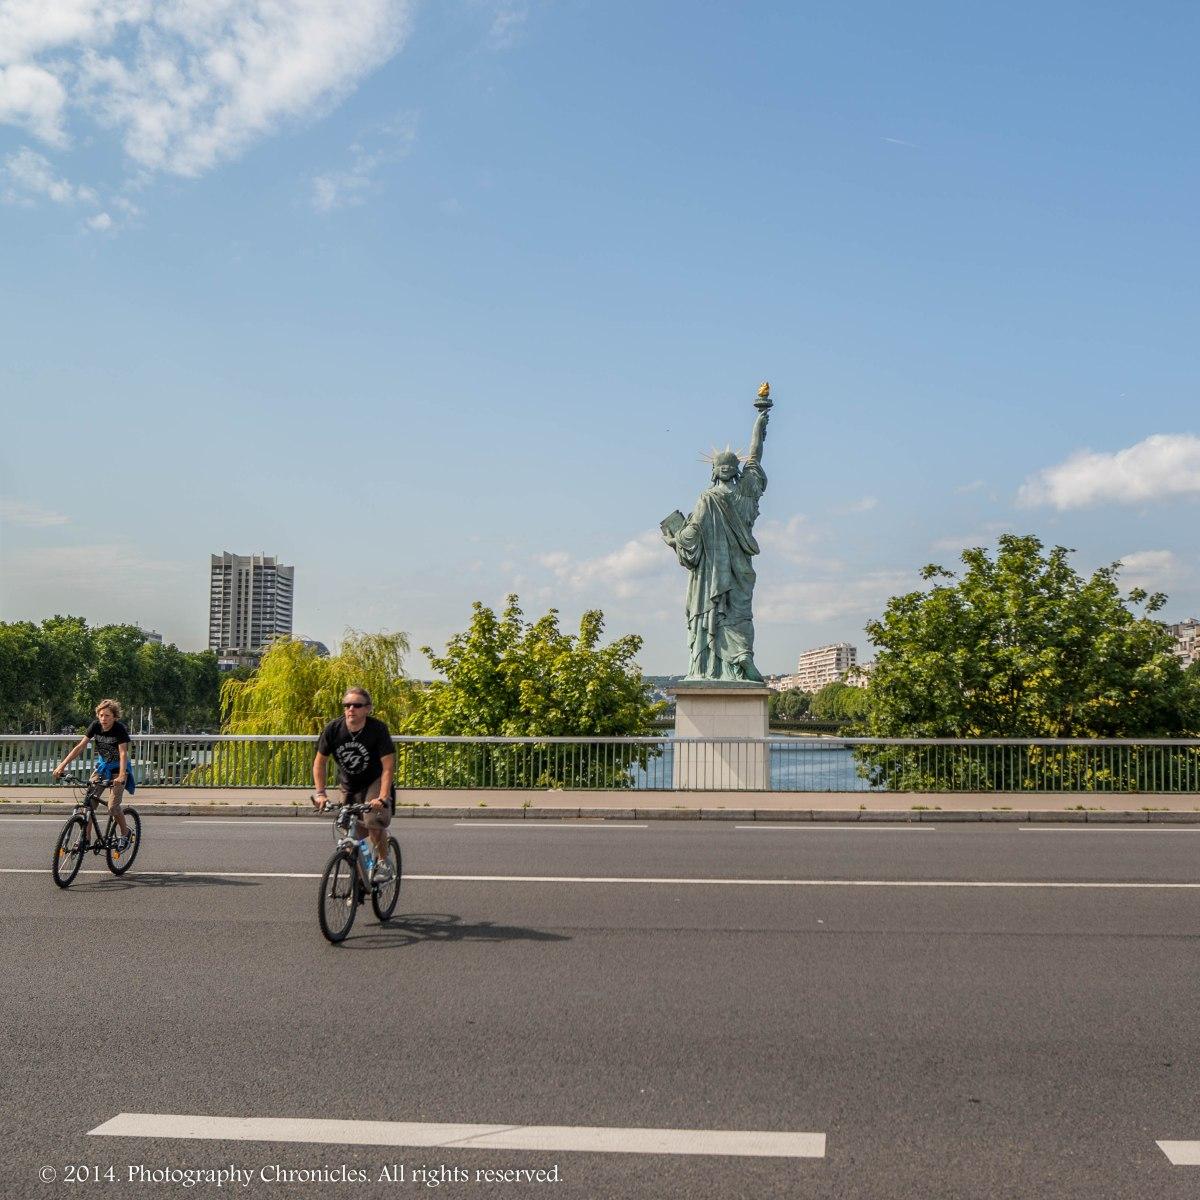 Statue of Liberty Paris variation 4